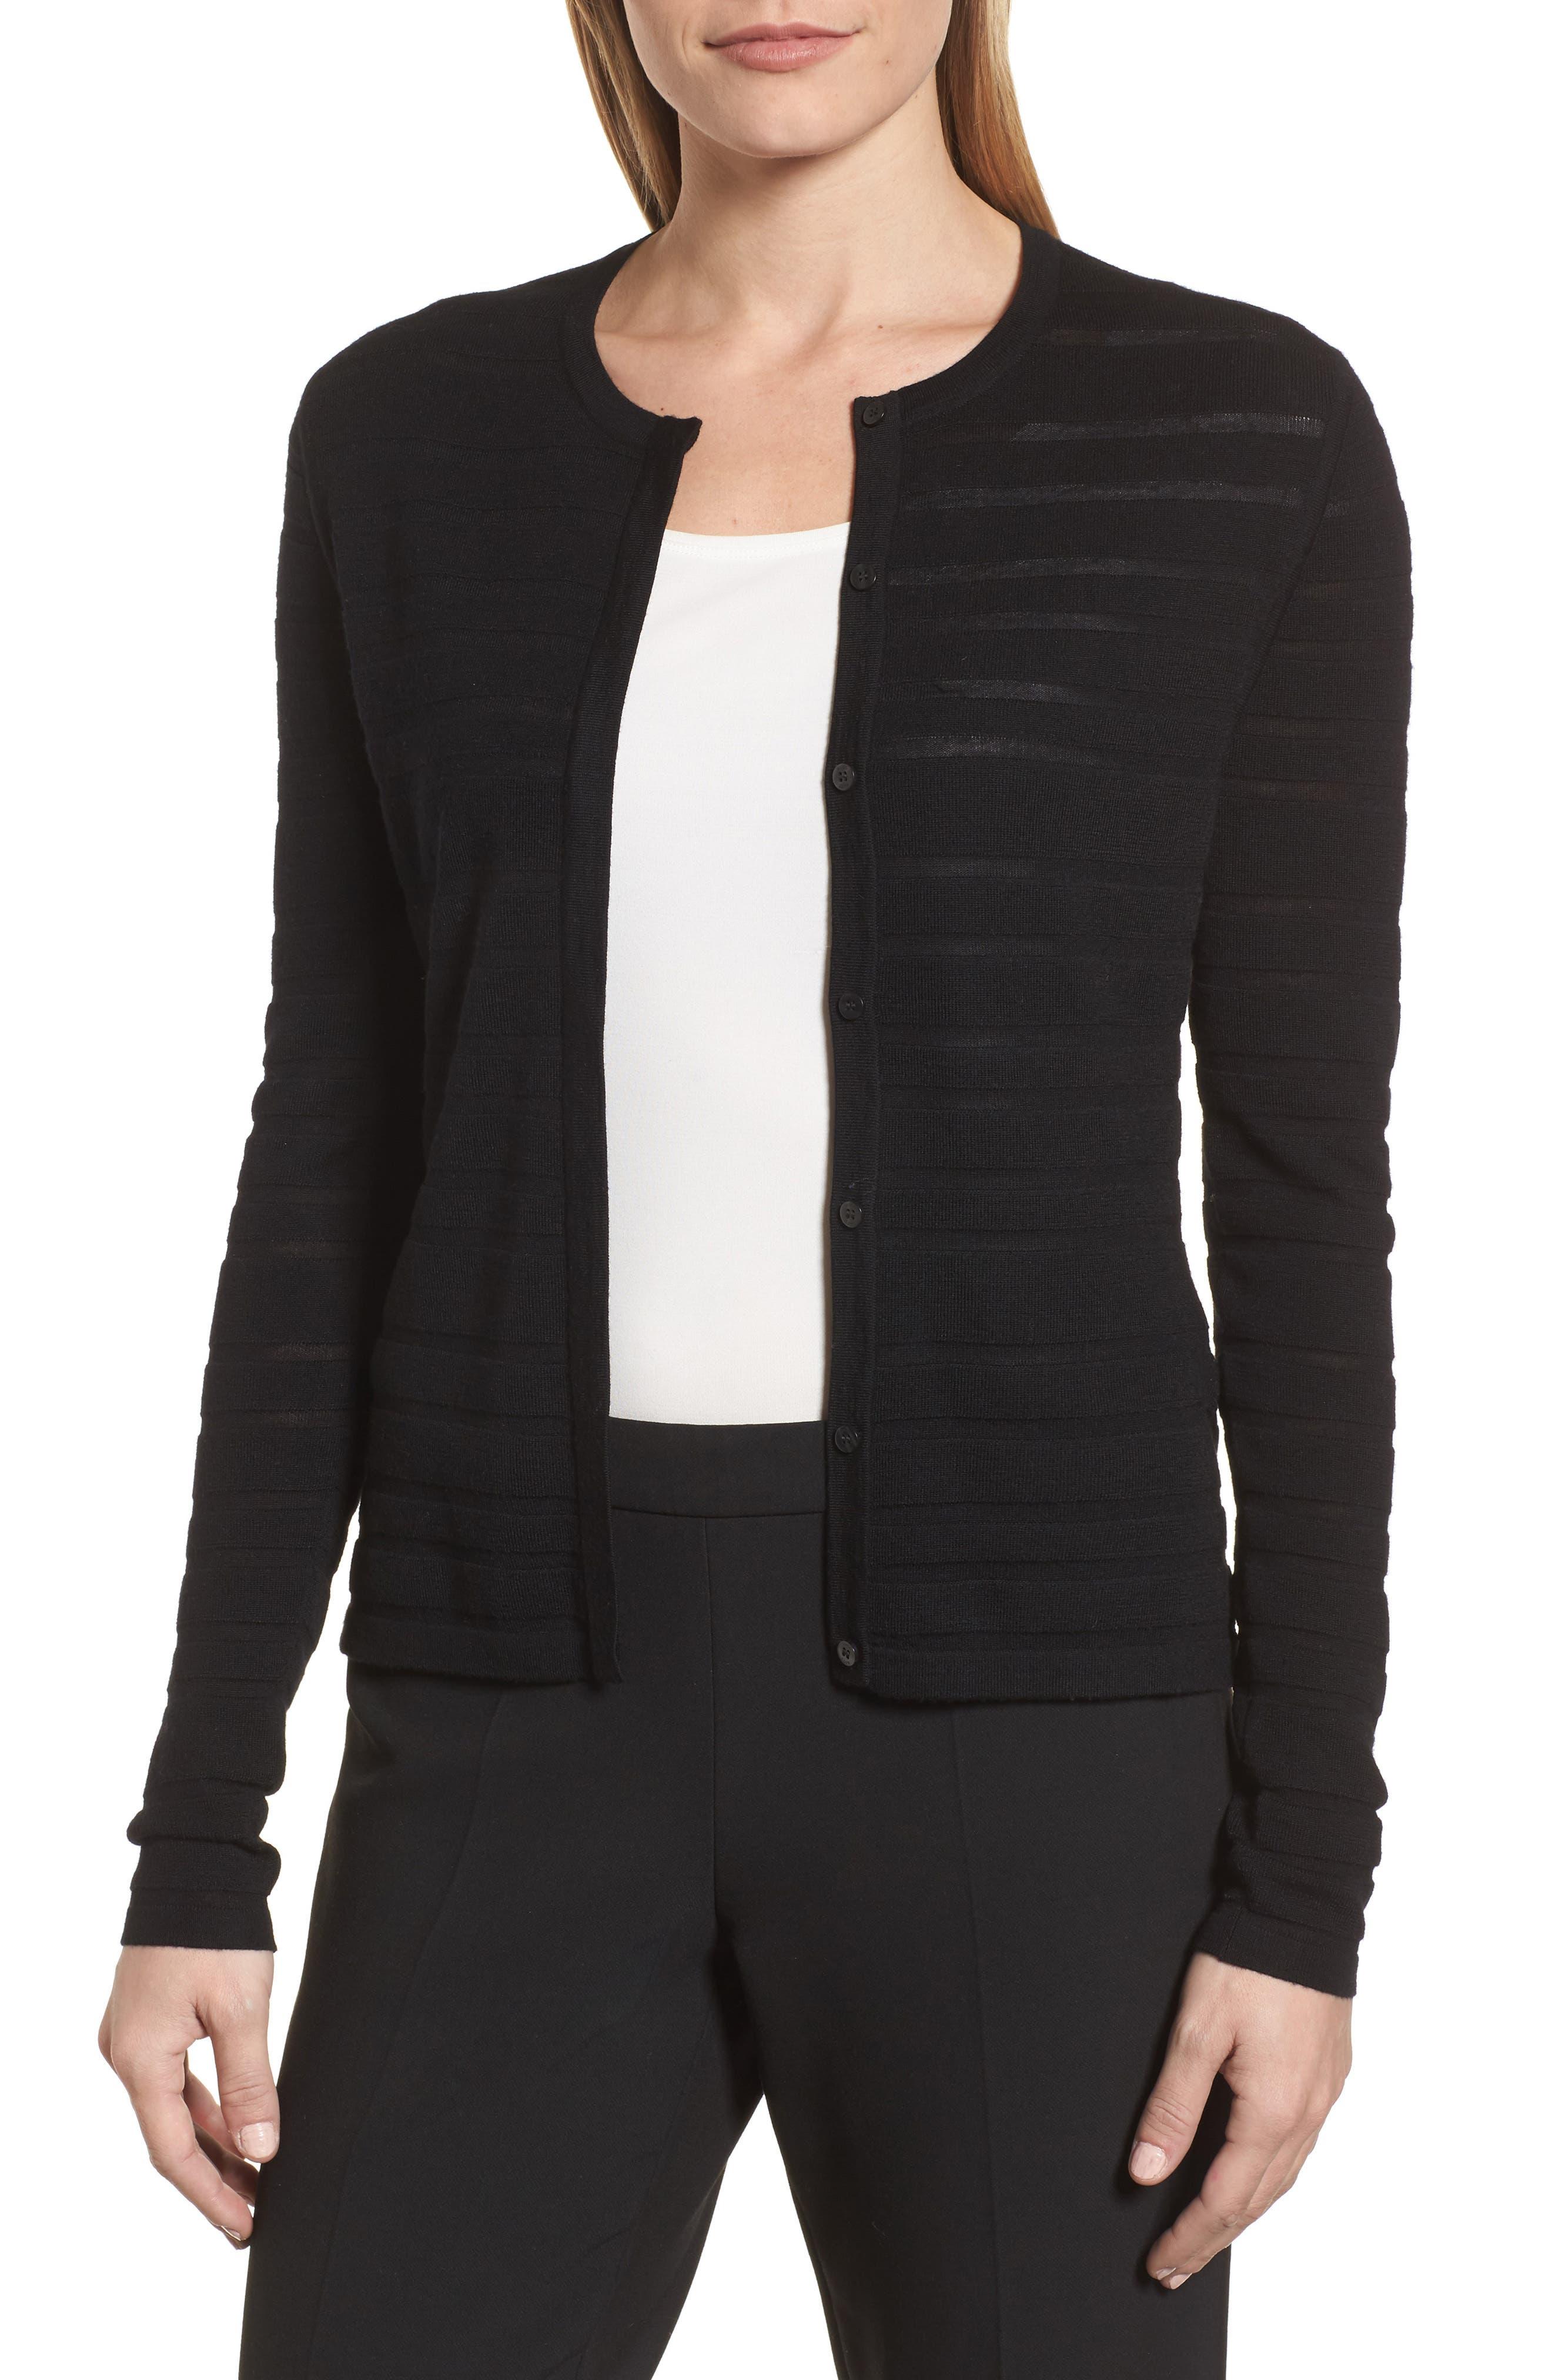 Fahsa Stripe Textured Wool Cardigan,                         Main,                         color, Black